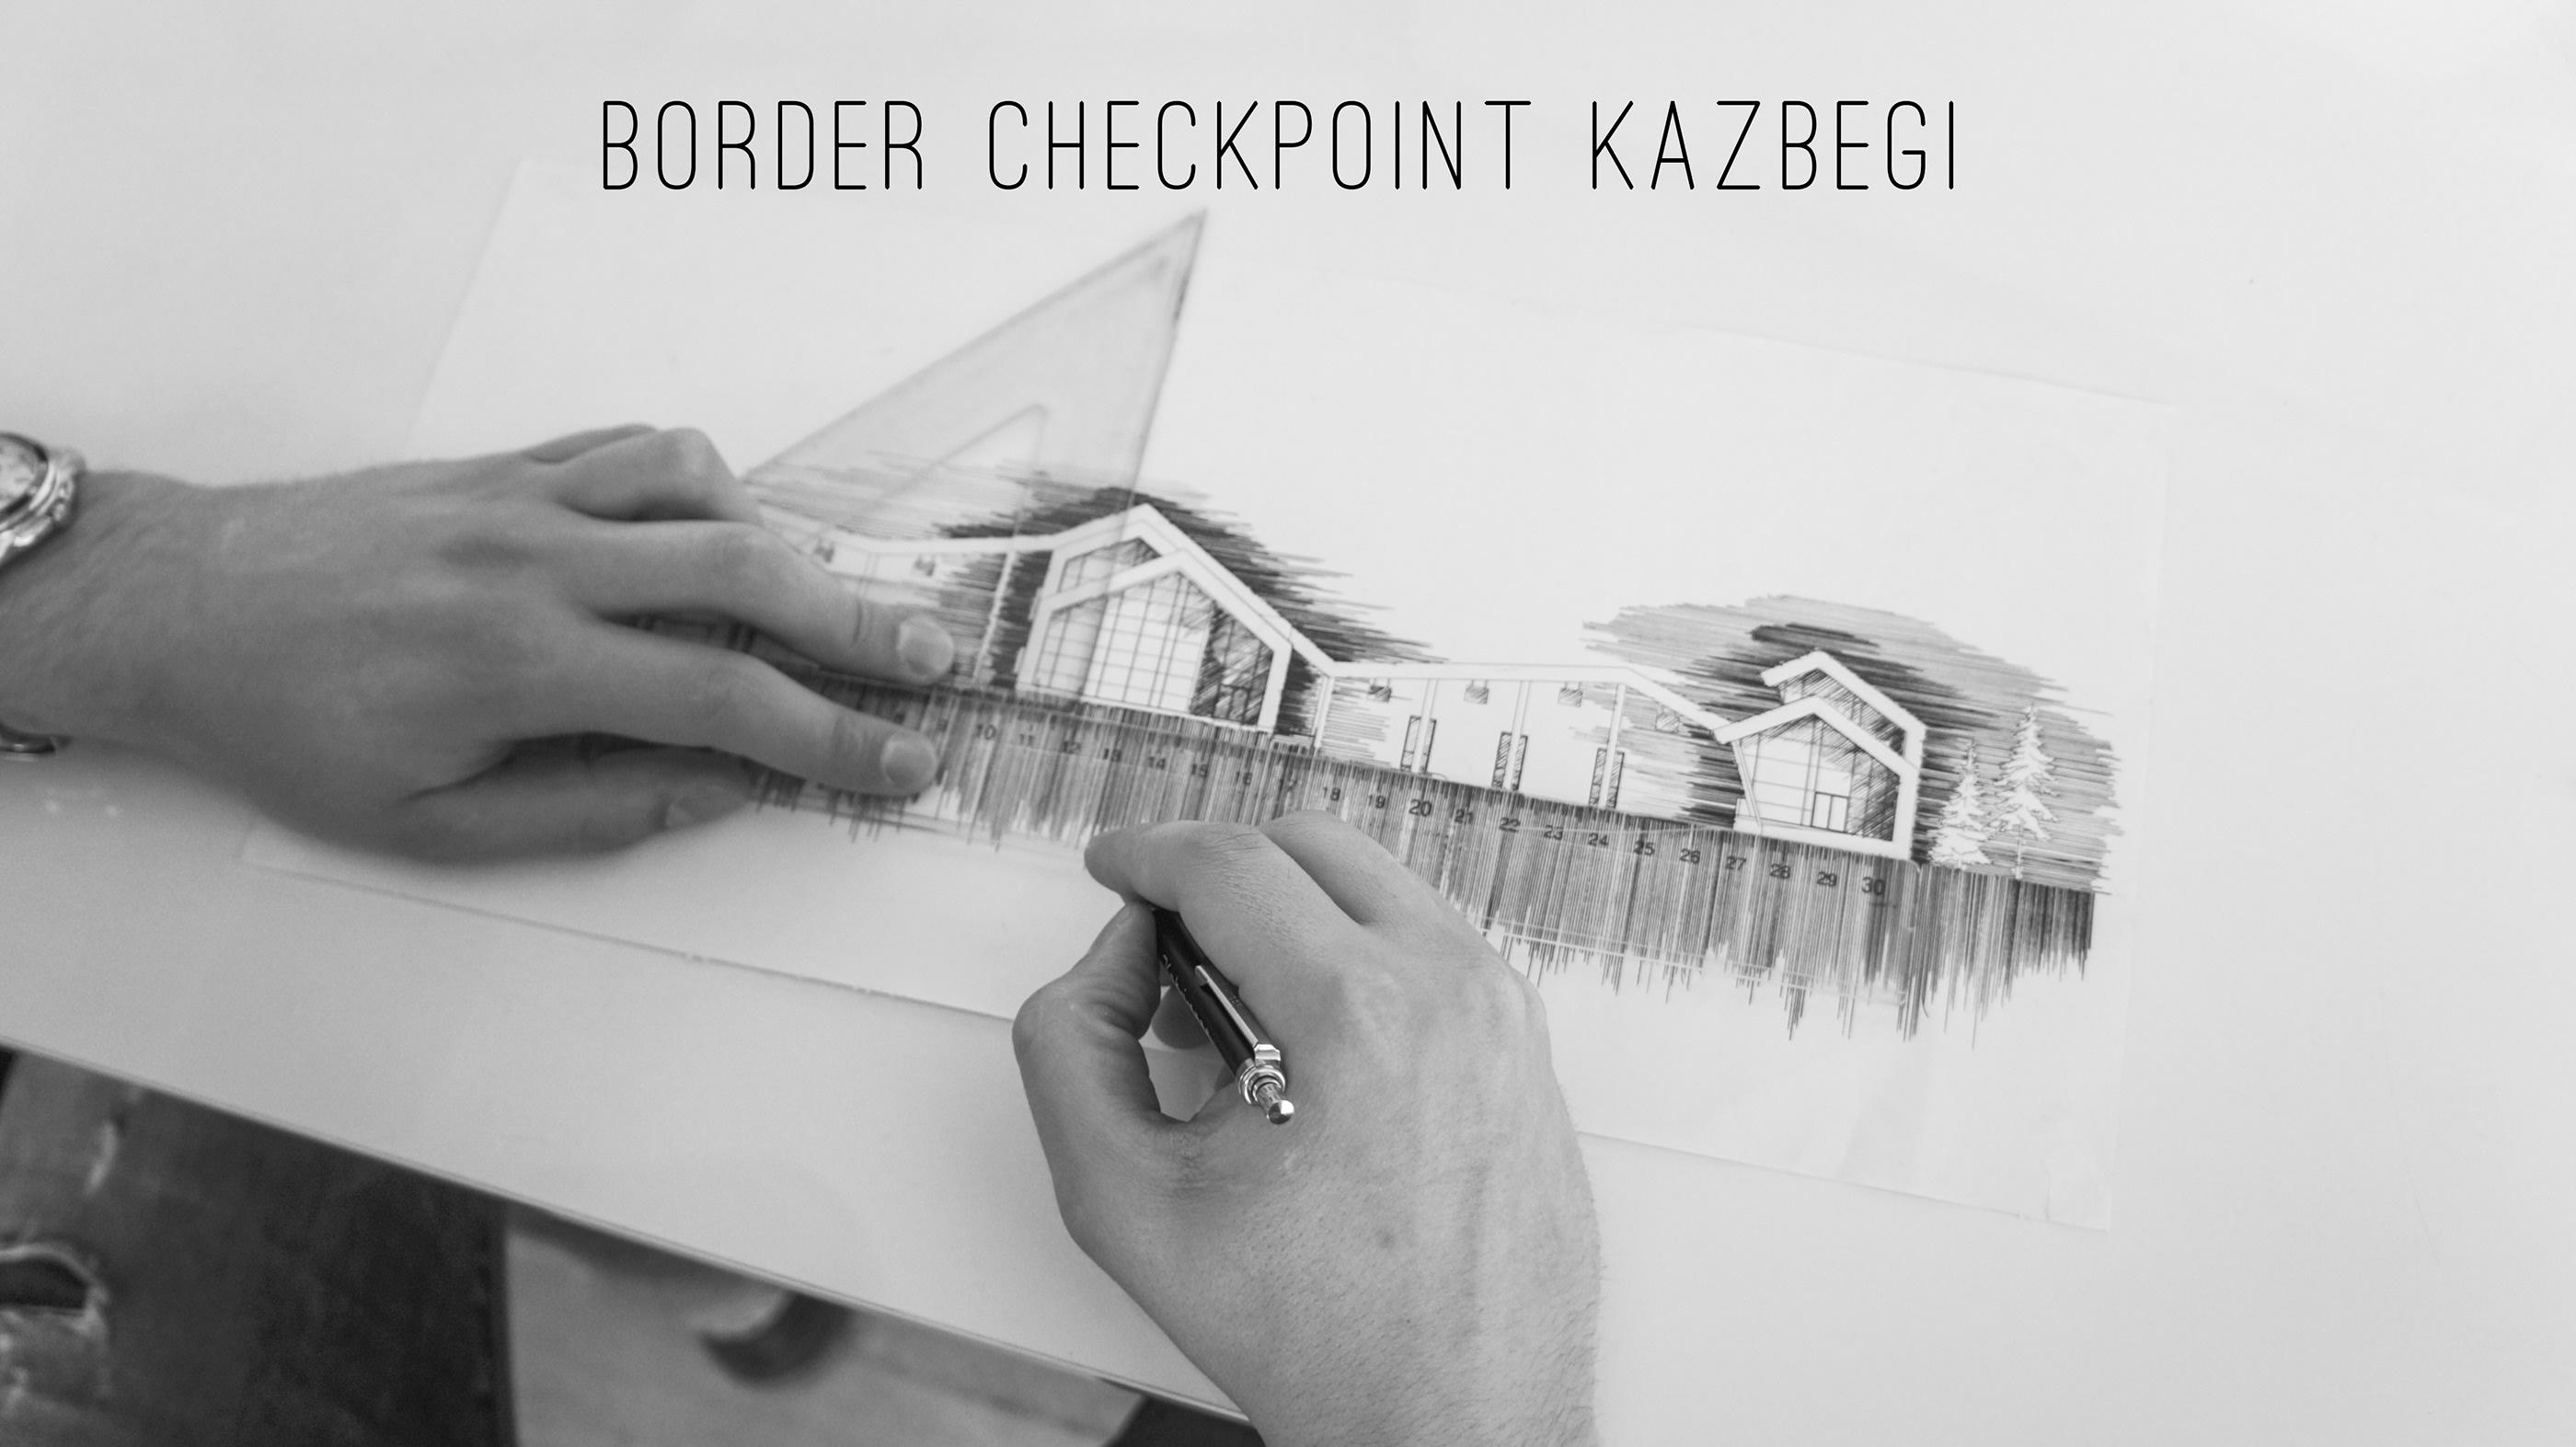 Border checkpoint Kazbegi / ყაზბეგის საბაჟო on